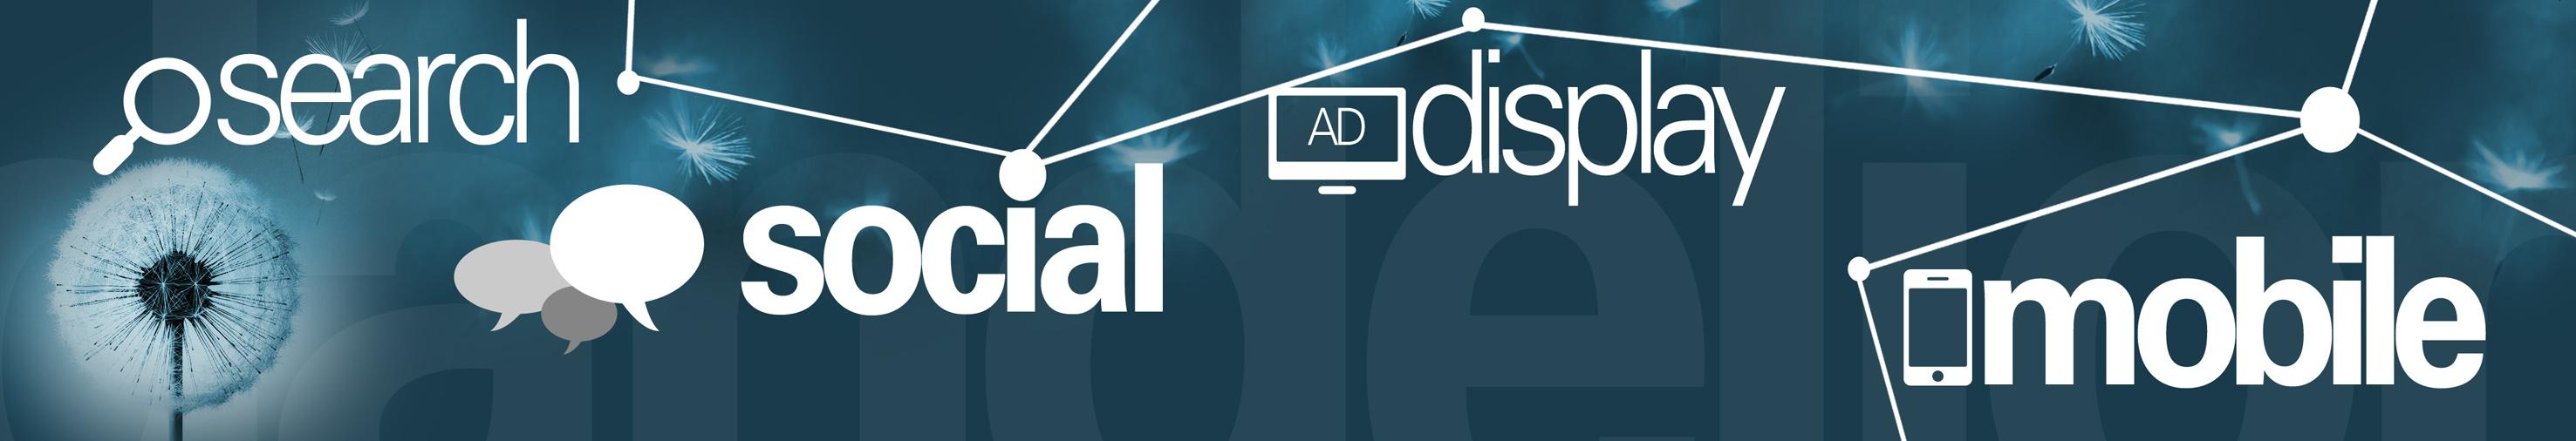 DANDELION: Advertising multi-piattaforma per la Cina